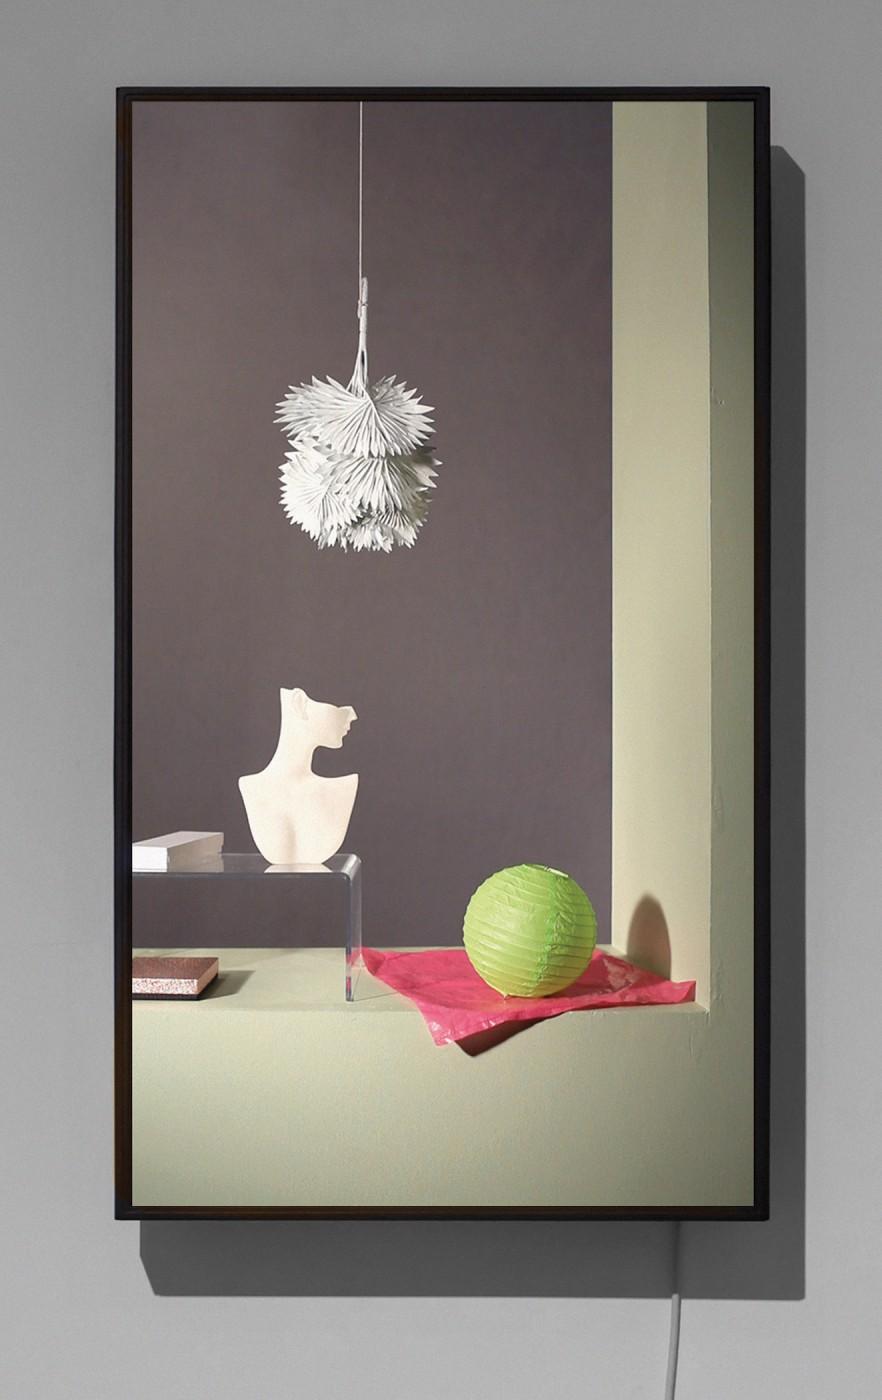 Owen Kydd, </span><span><em>Canvas Leaves, Torso and Lantern</em>, </span><span>2011 Courtesy of the artist